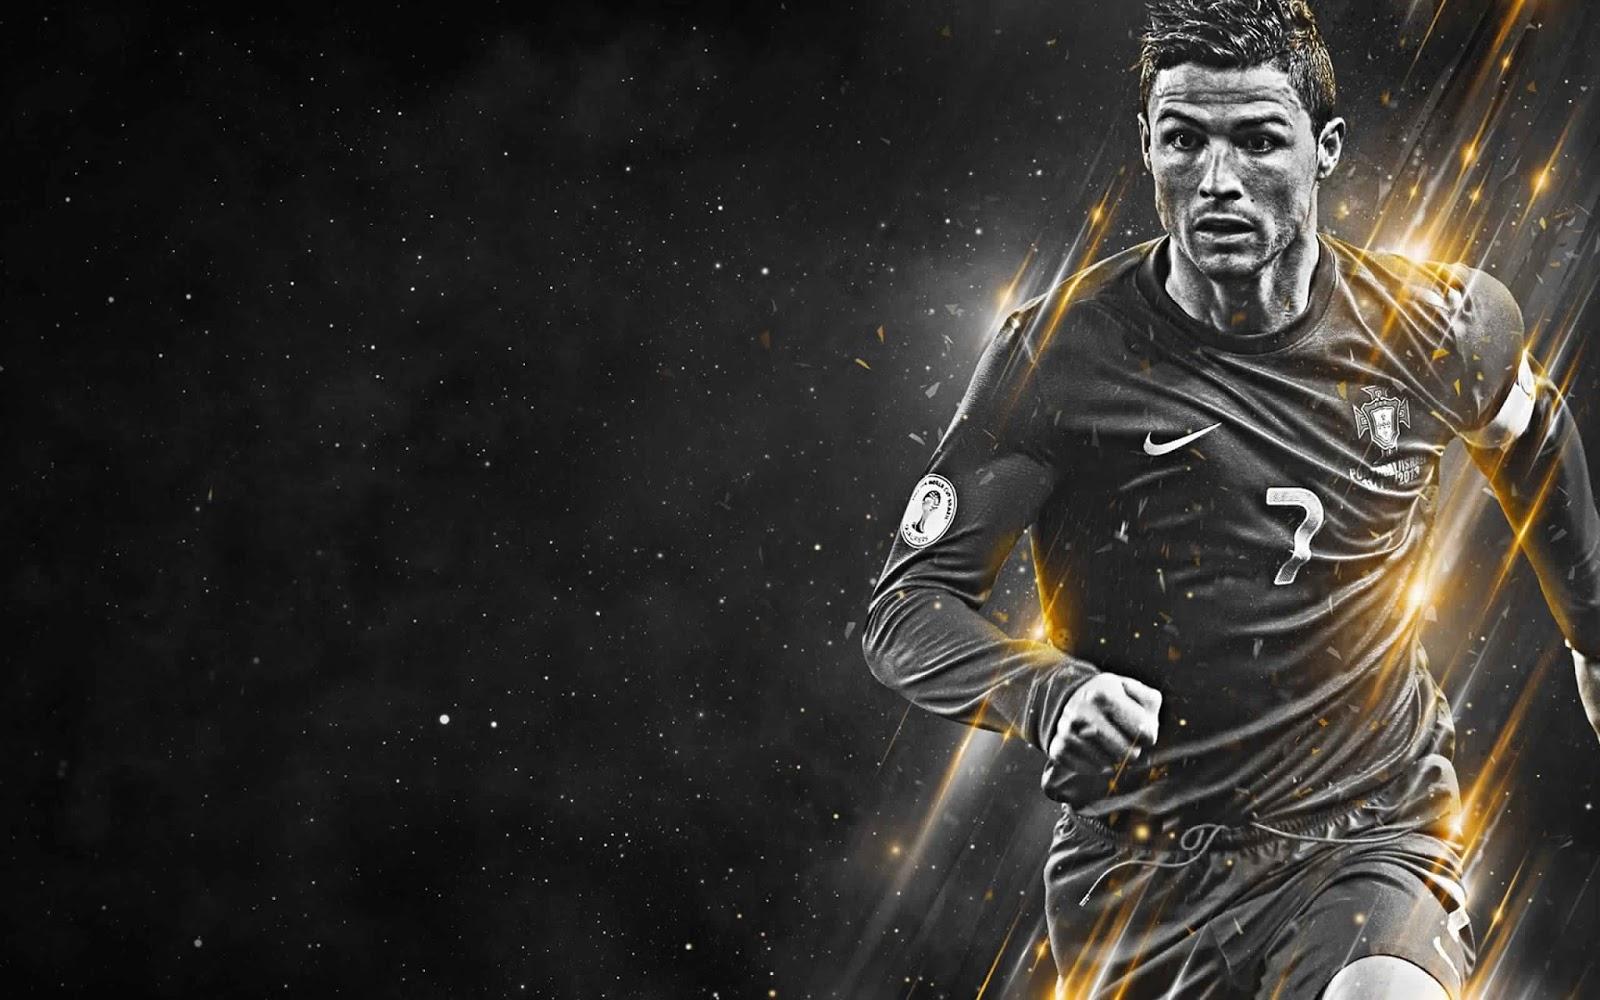 Cristiano Ronaldo Wallpapers HD Real Madrid 2015 2016 Calma Calma 1600x1000